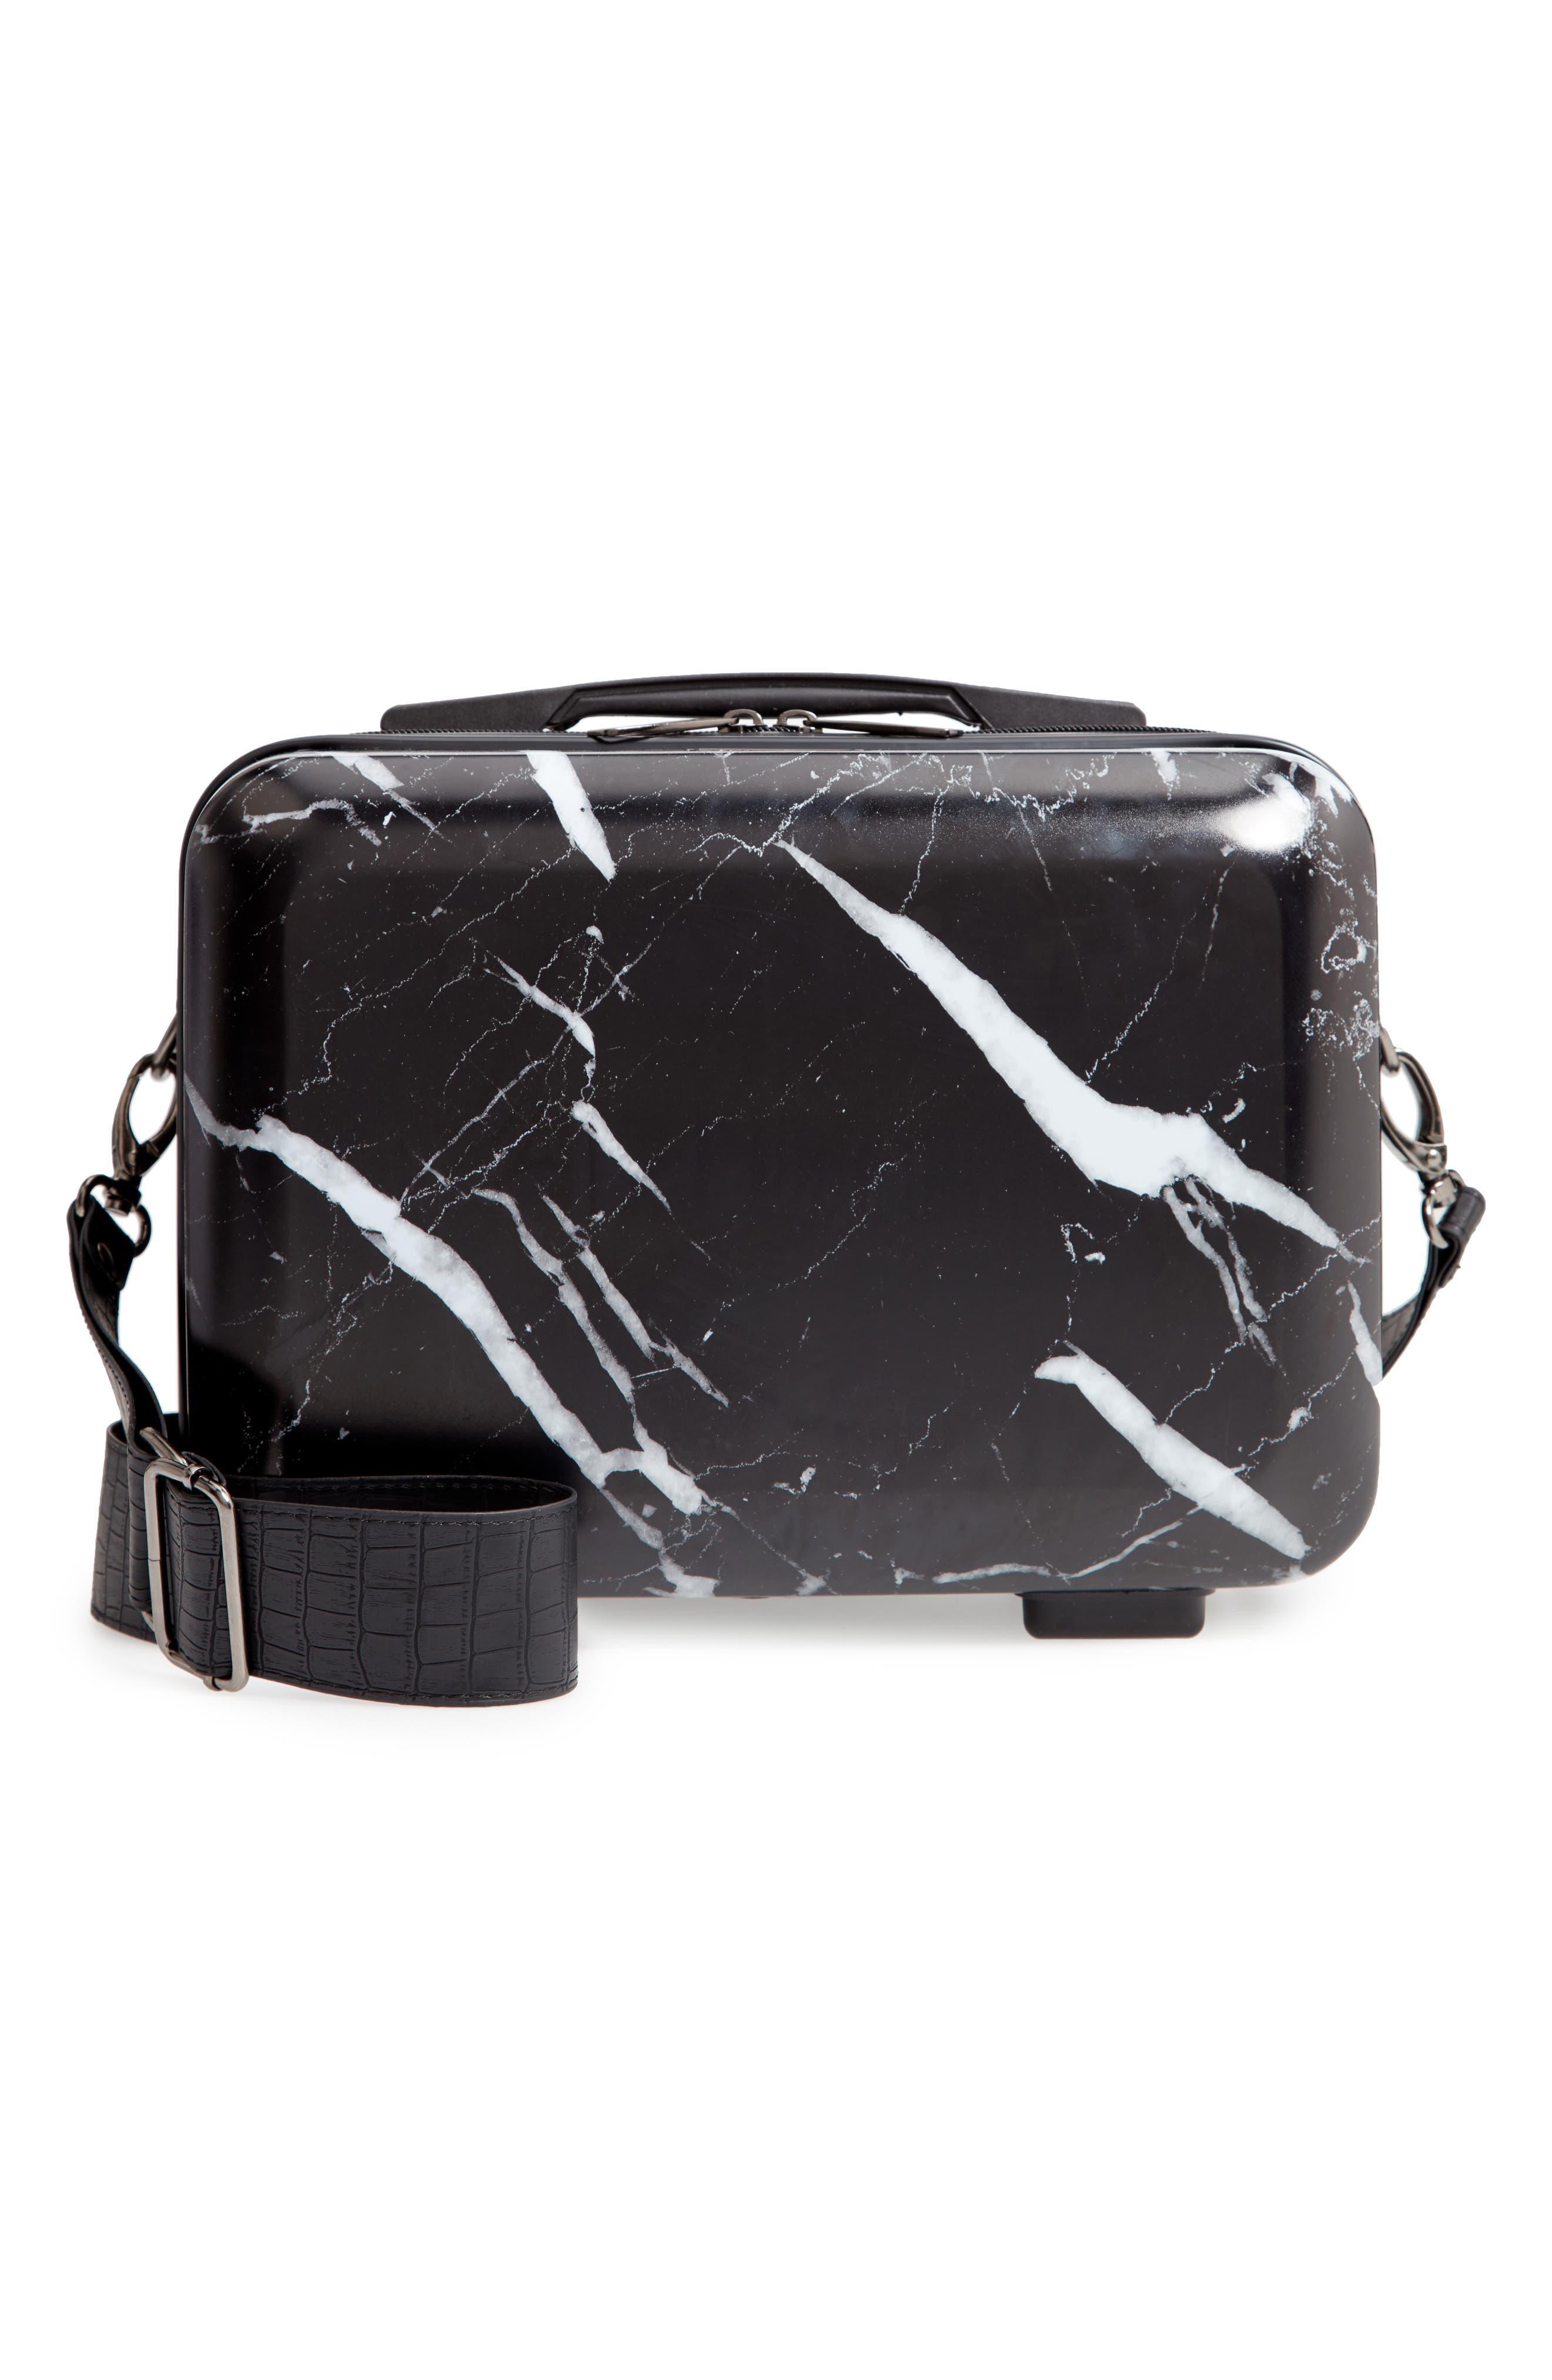 Hardshell Cosmetics Case,                         Main,                         color, MIDNIGHT MARBLE